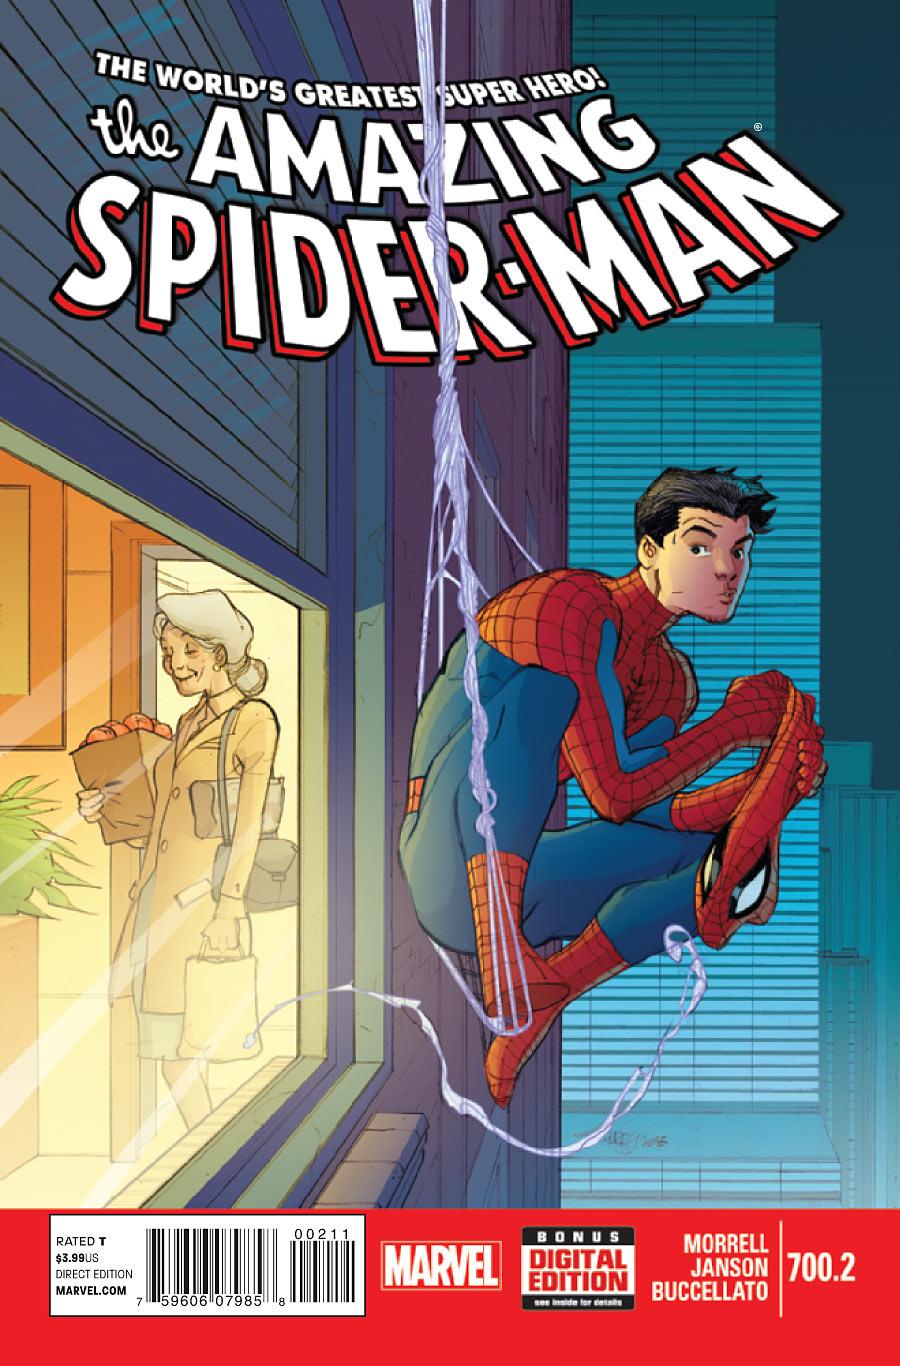 The Amazing Spider-Man #700.2